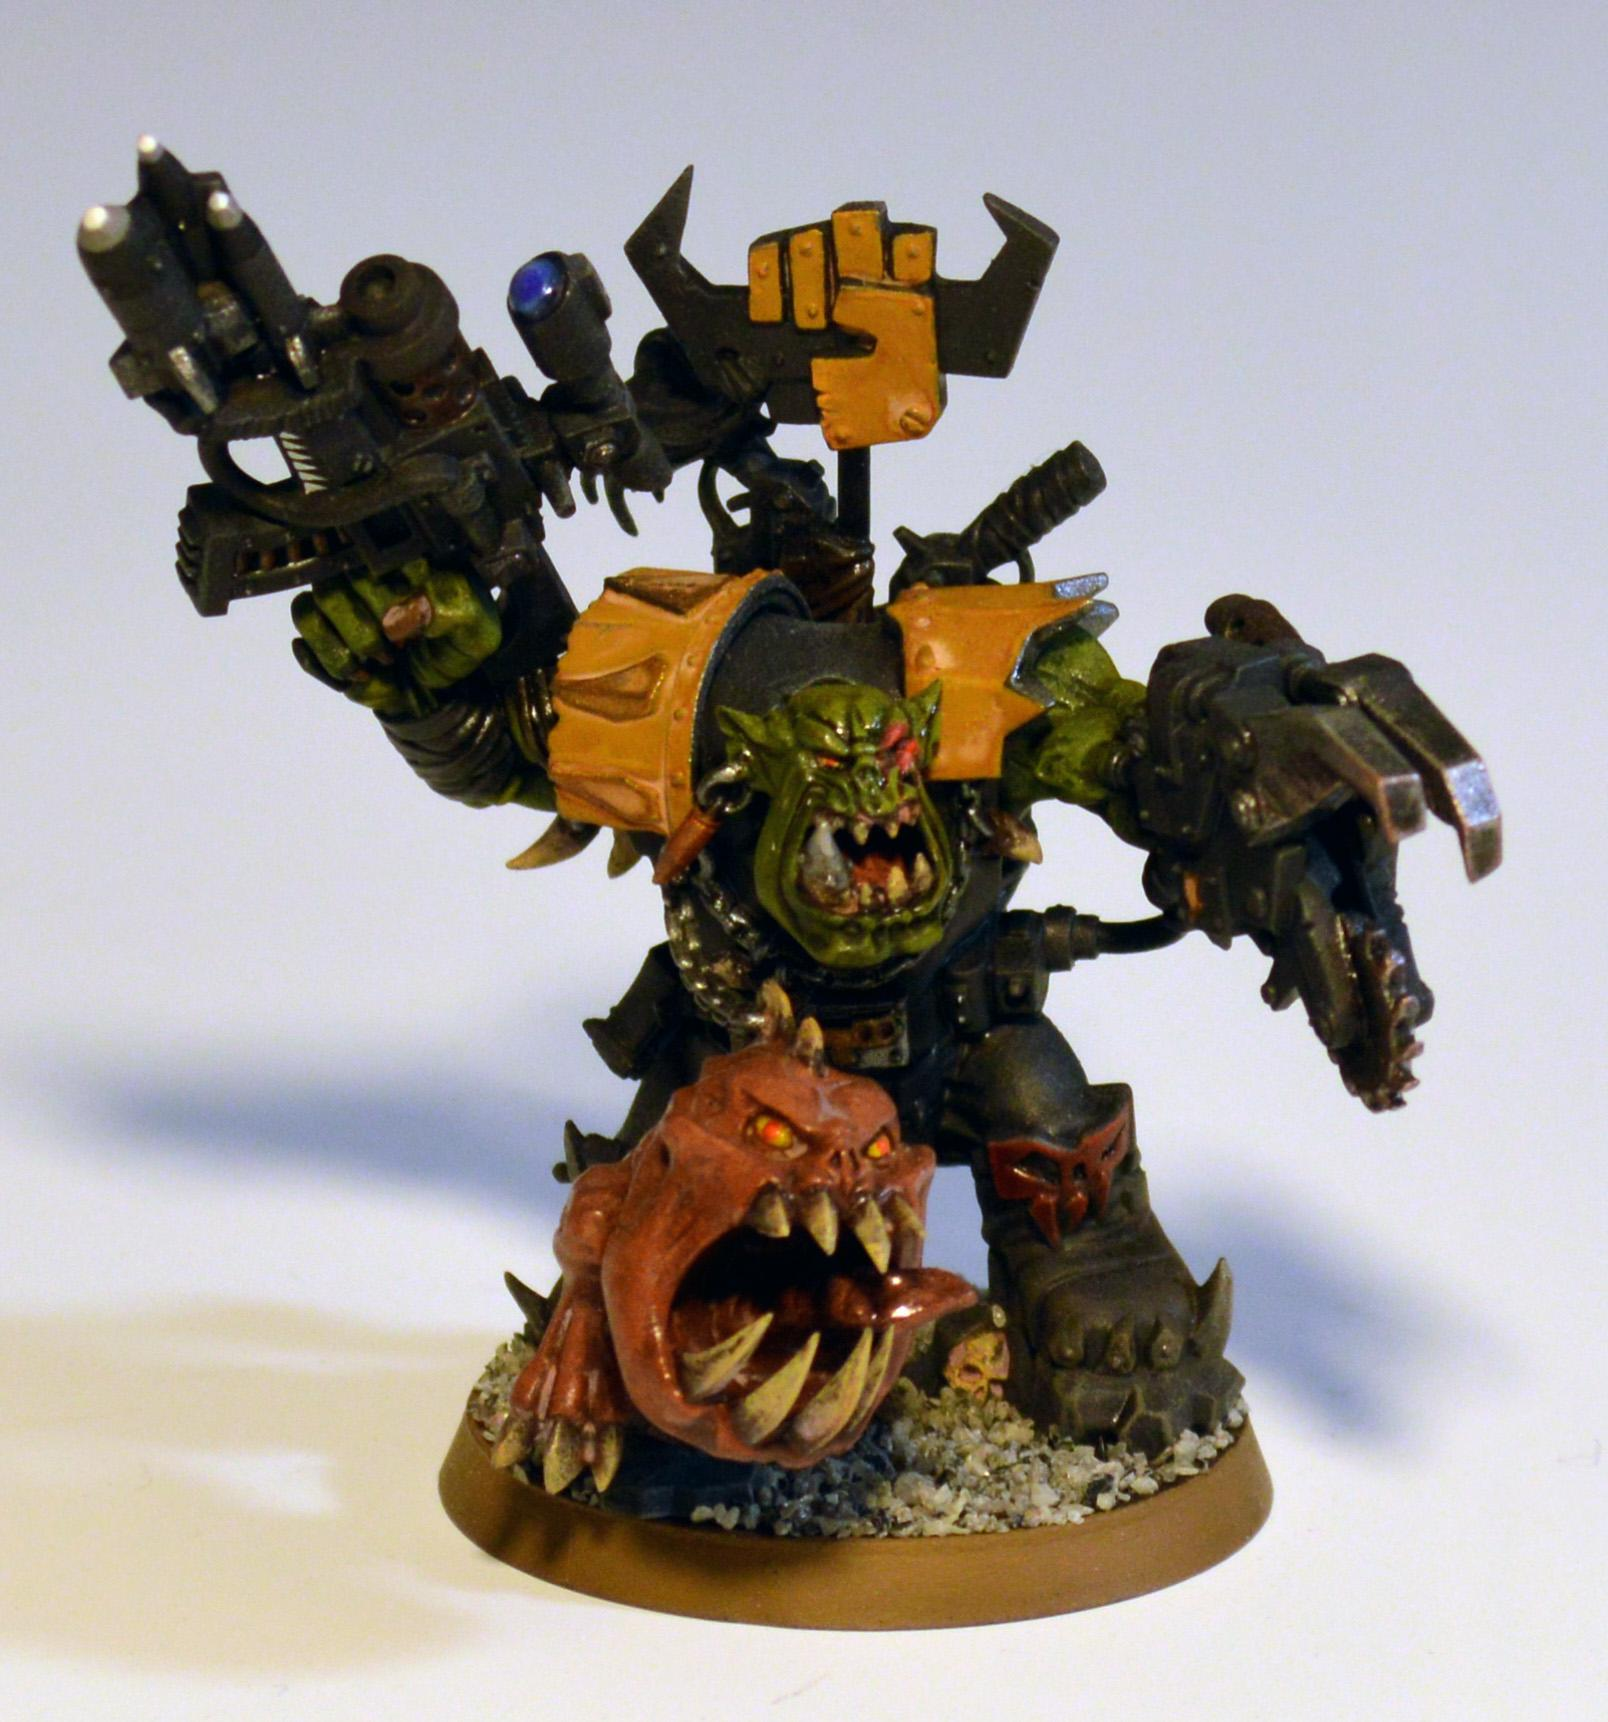 Grukk Face-rippa, Orks, Warboss, Warhammer 40,000